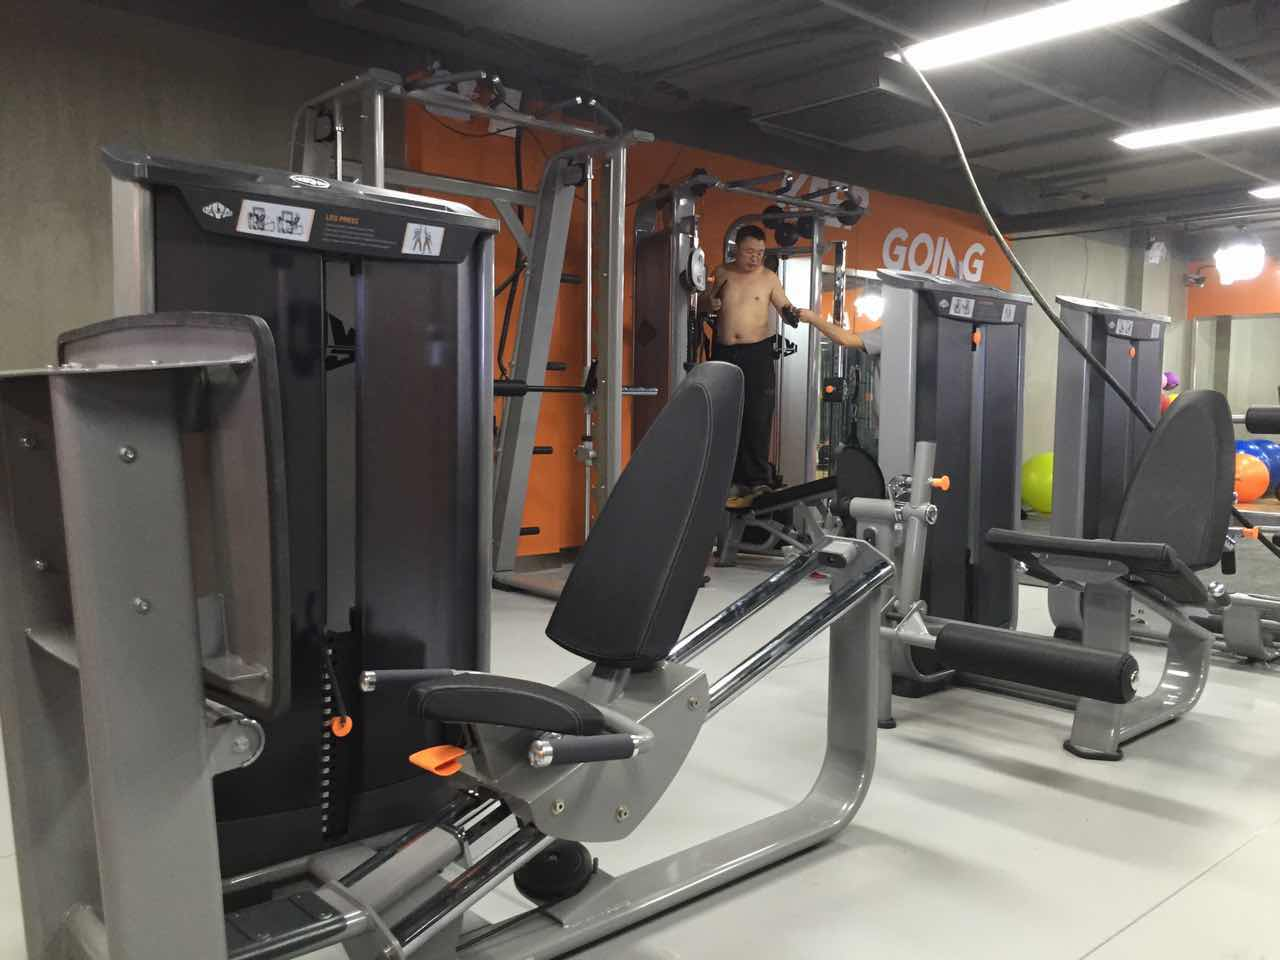 vita commerical gym equipment